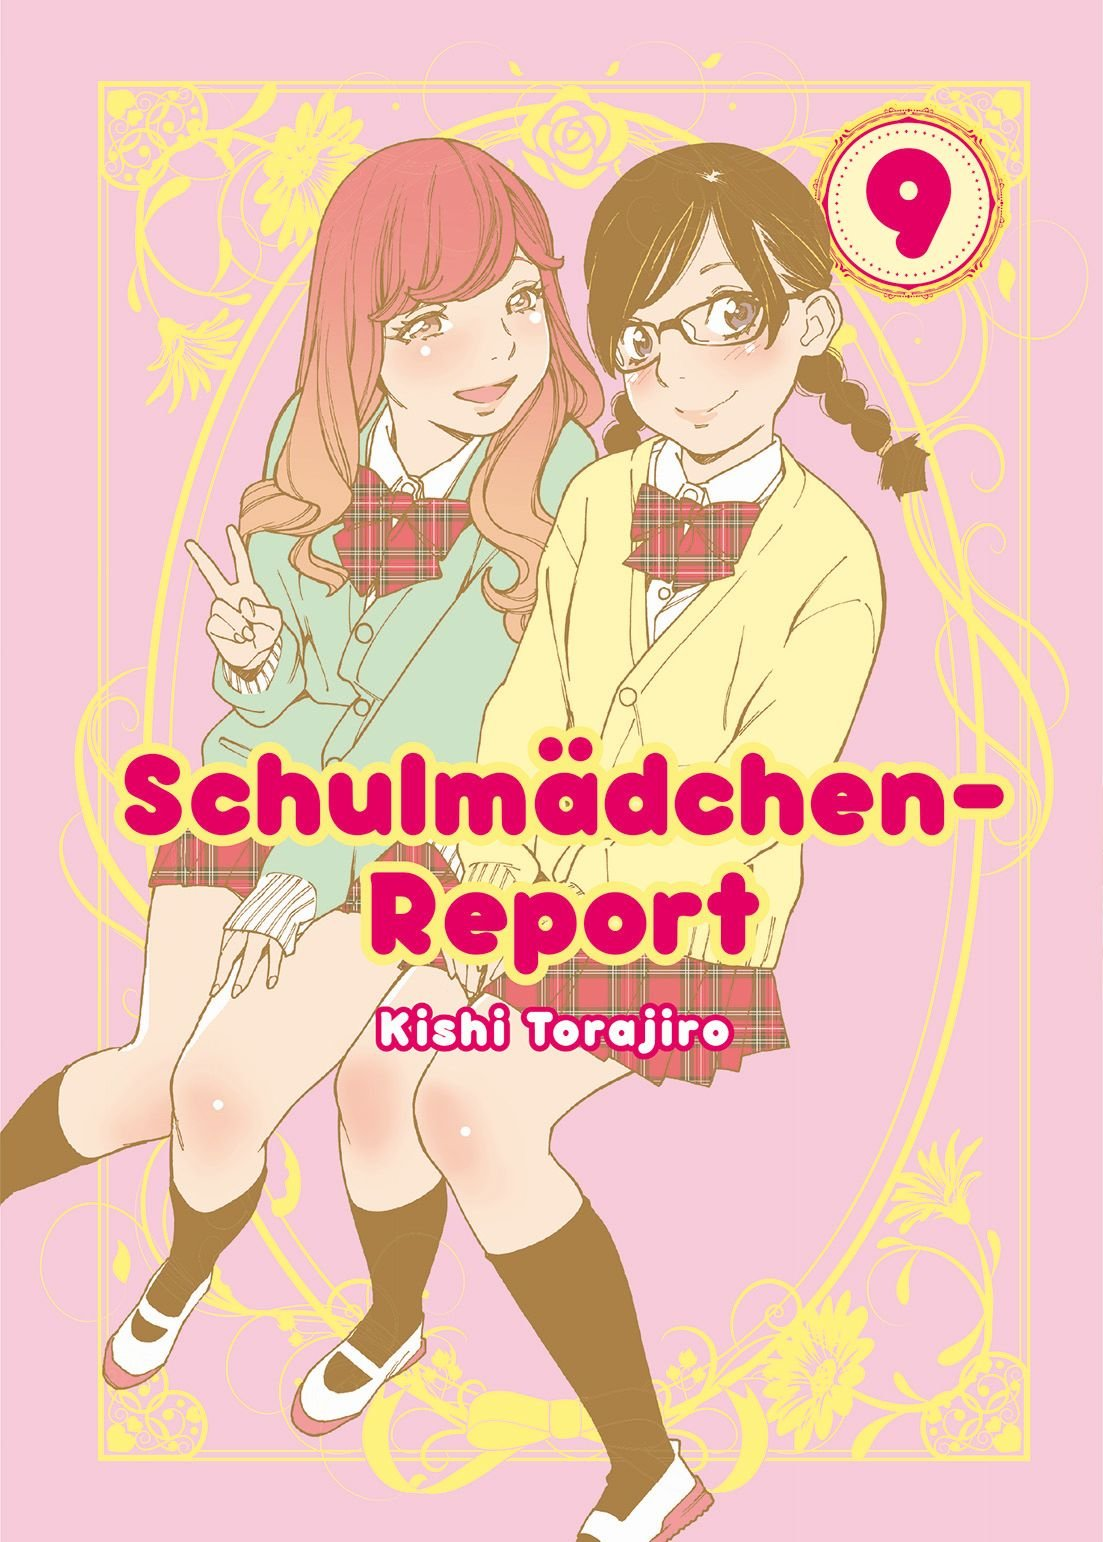 Schulmädchen-Report: Bd. 9 Taschenbuch – 23. April 2018 Kishi Torajiro Burkhard Höfler Panini 3741606235